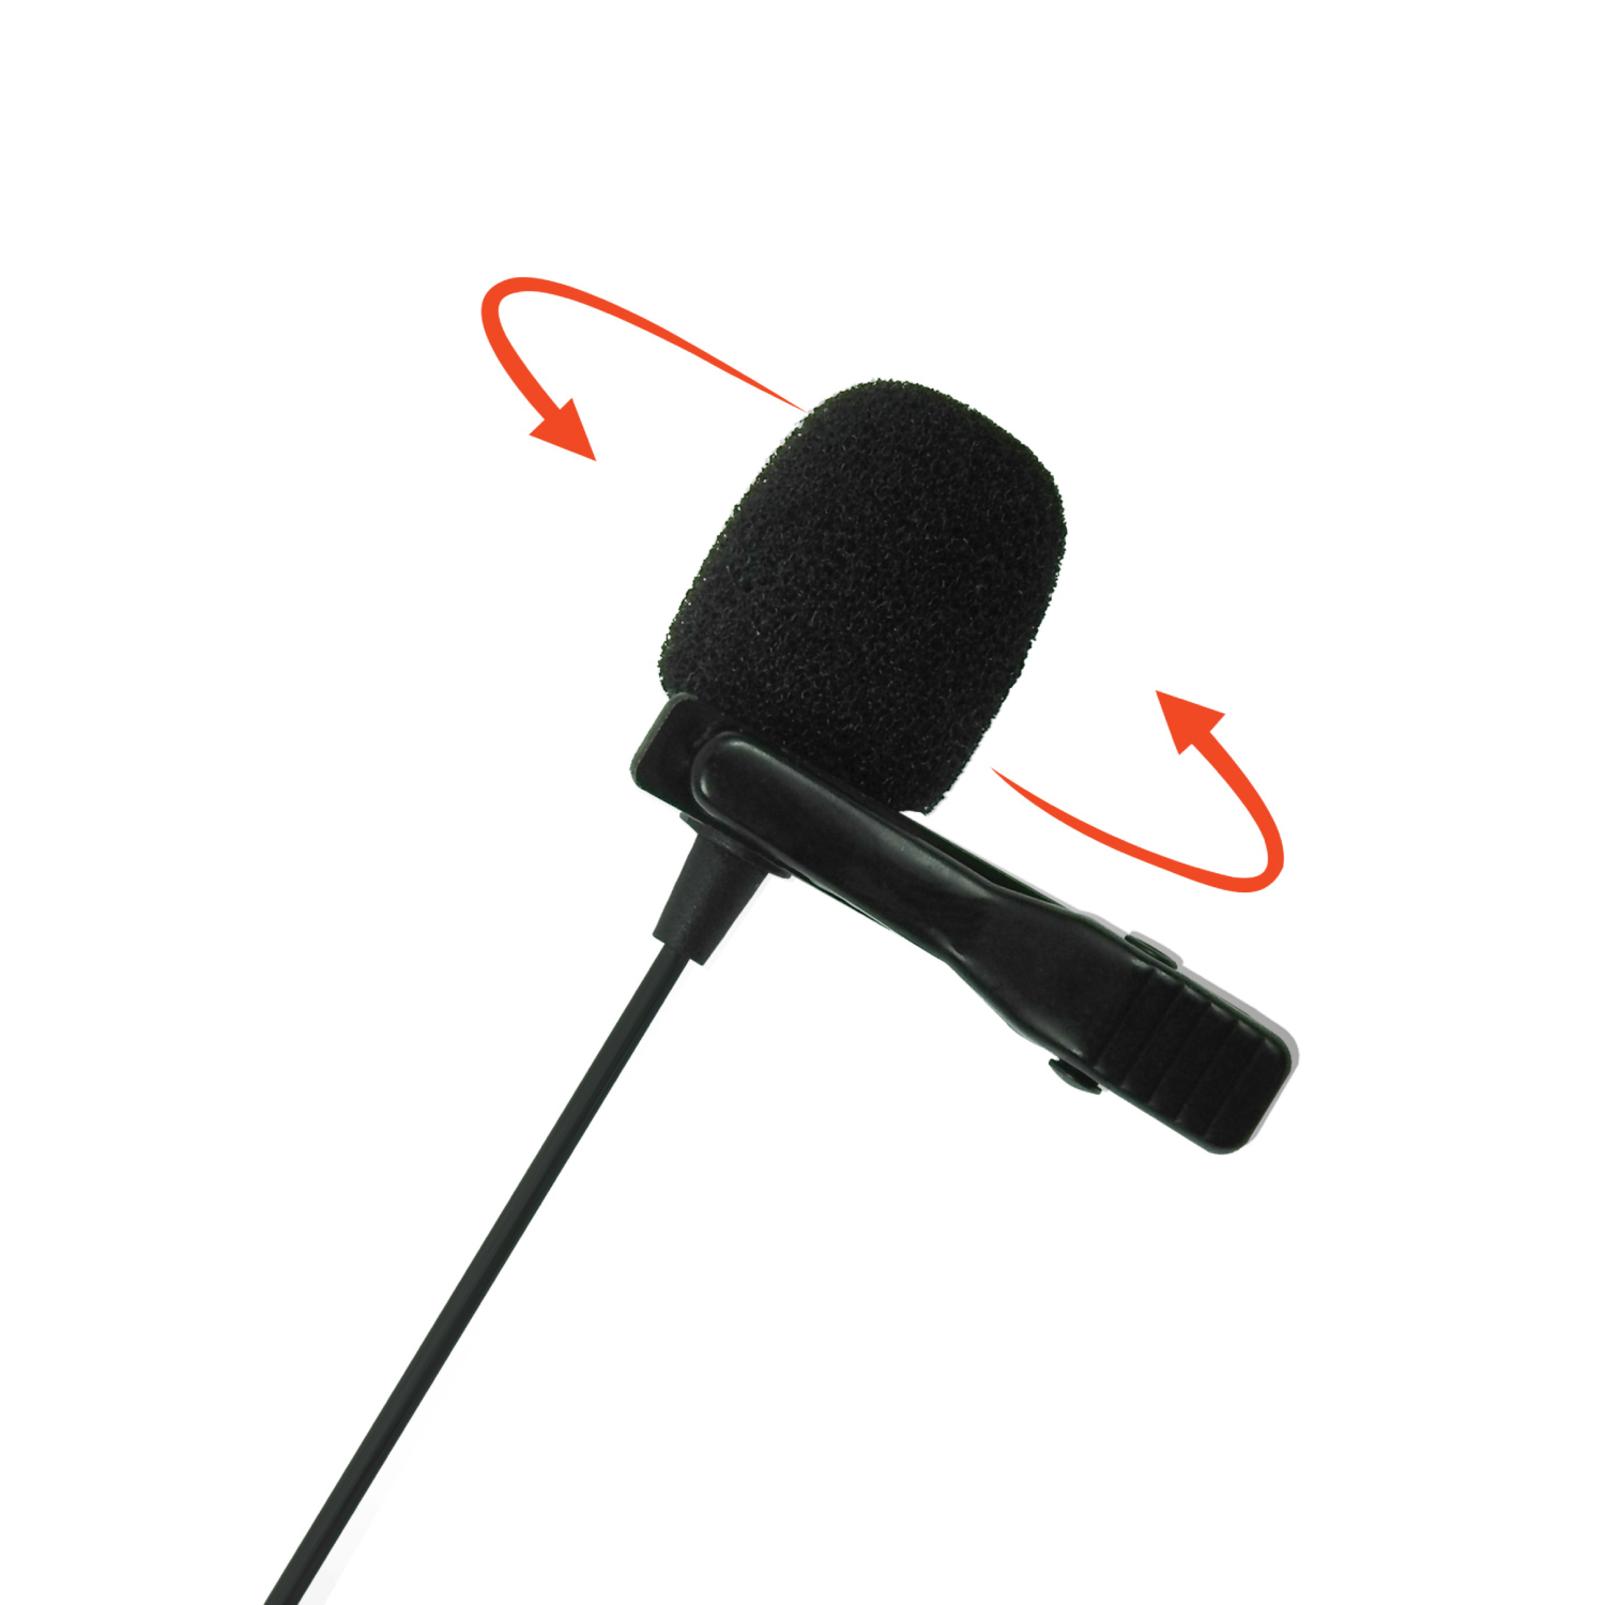 JBLCSLM20B - Black - Battery-Powered Lavalier Microphone - Detailshot 1